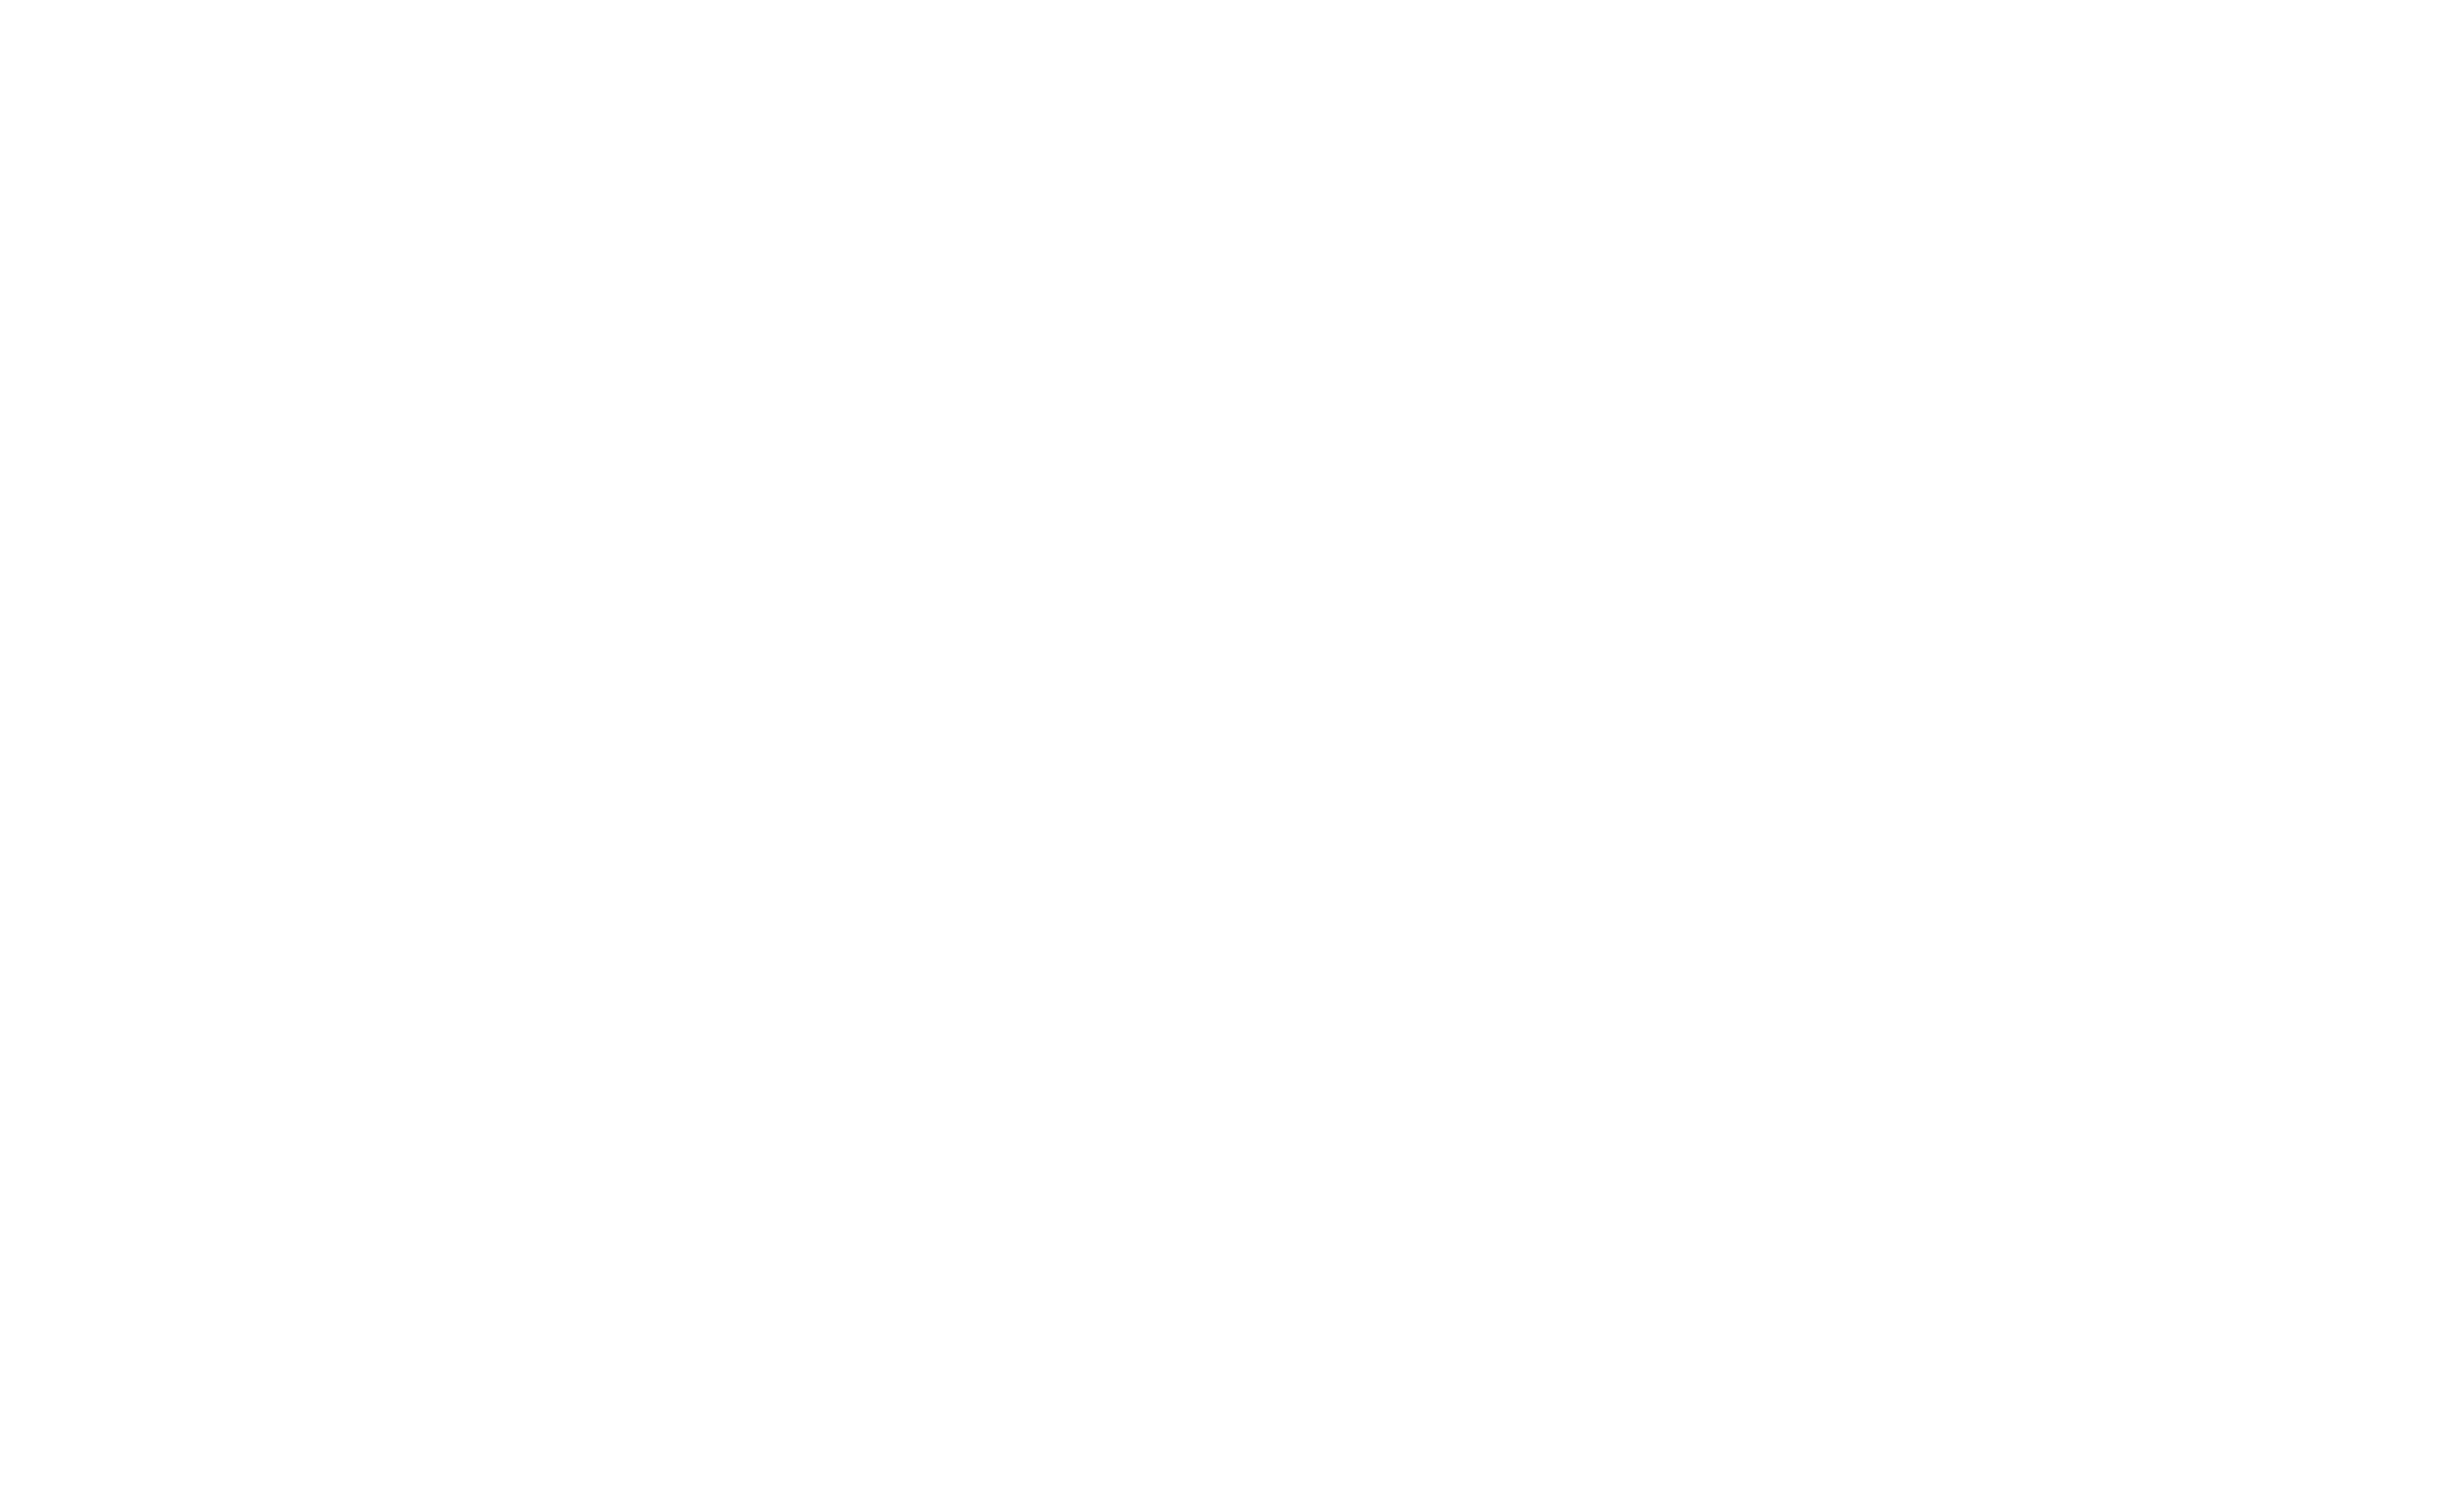 10042019-LOGO-EMYRTAN-J-praktijk-LIJN-1.png